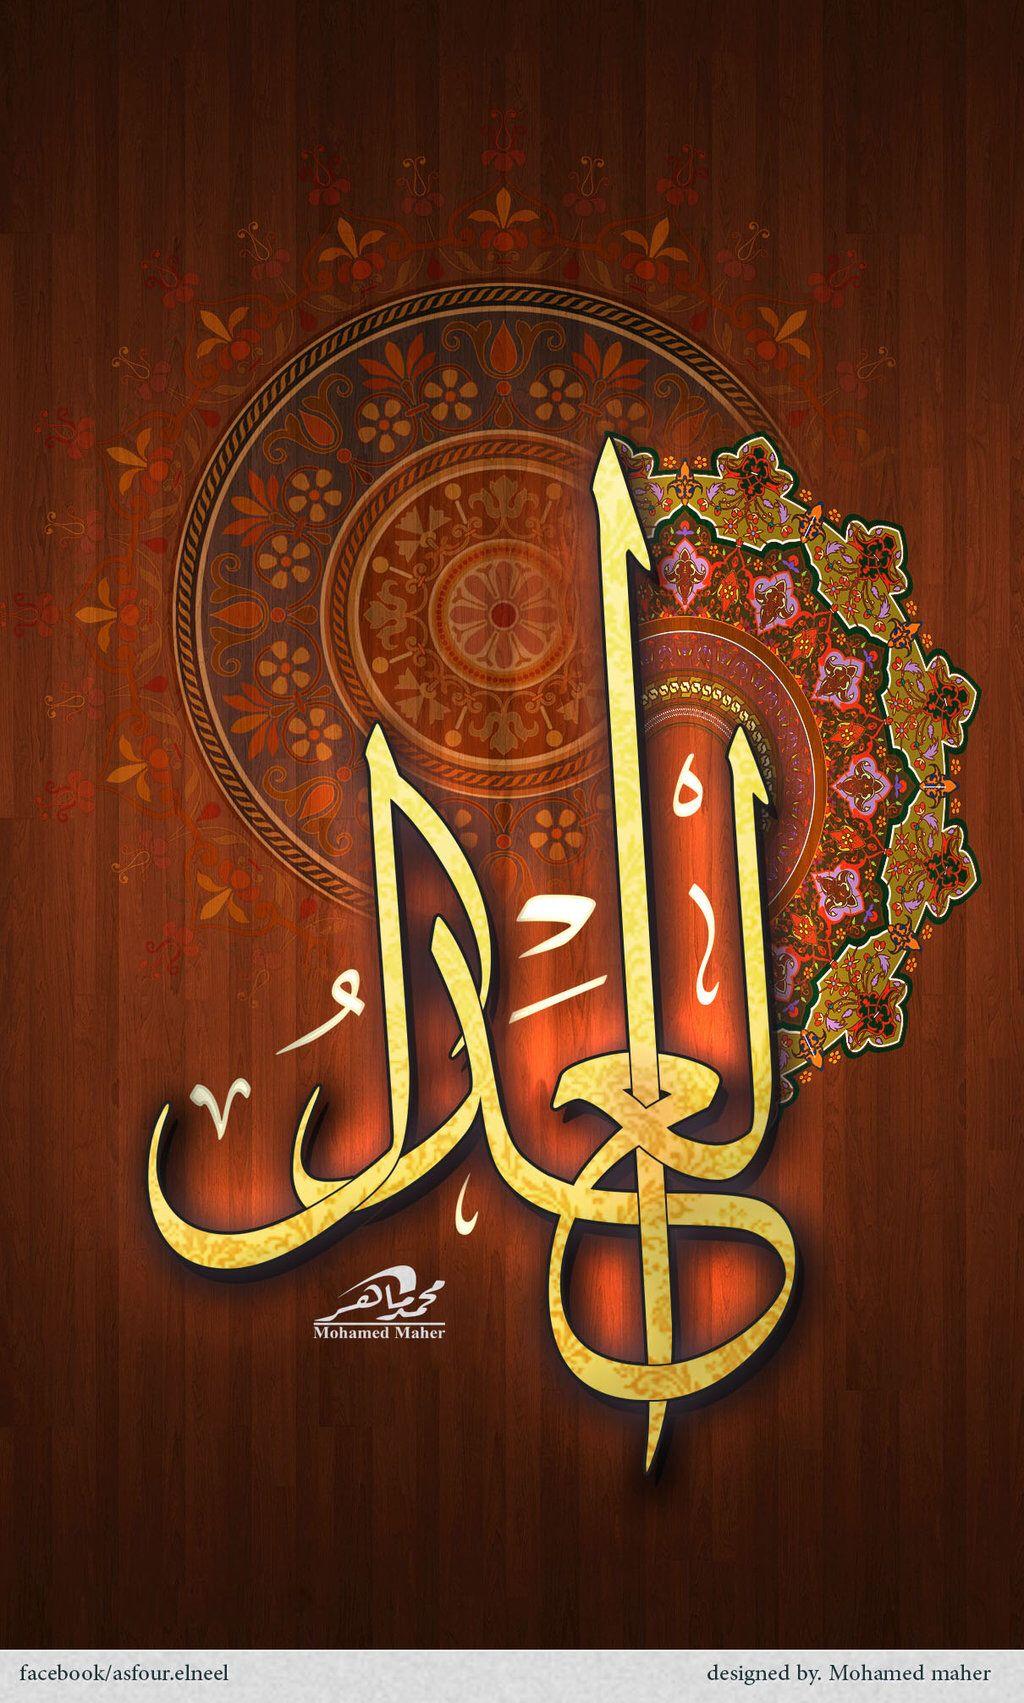 (DOC) Pengertian Al-Adl (Maha Adil | Renny Sunflower